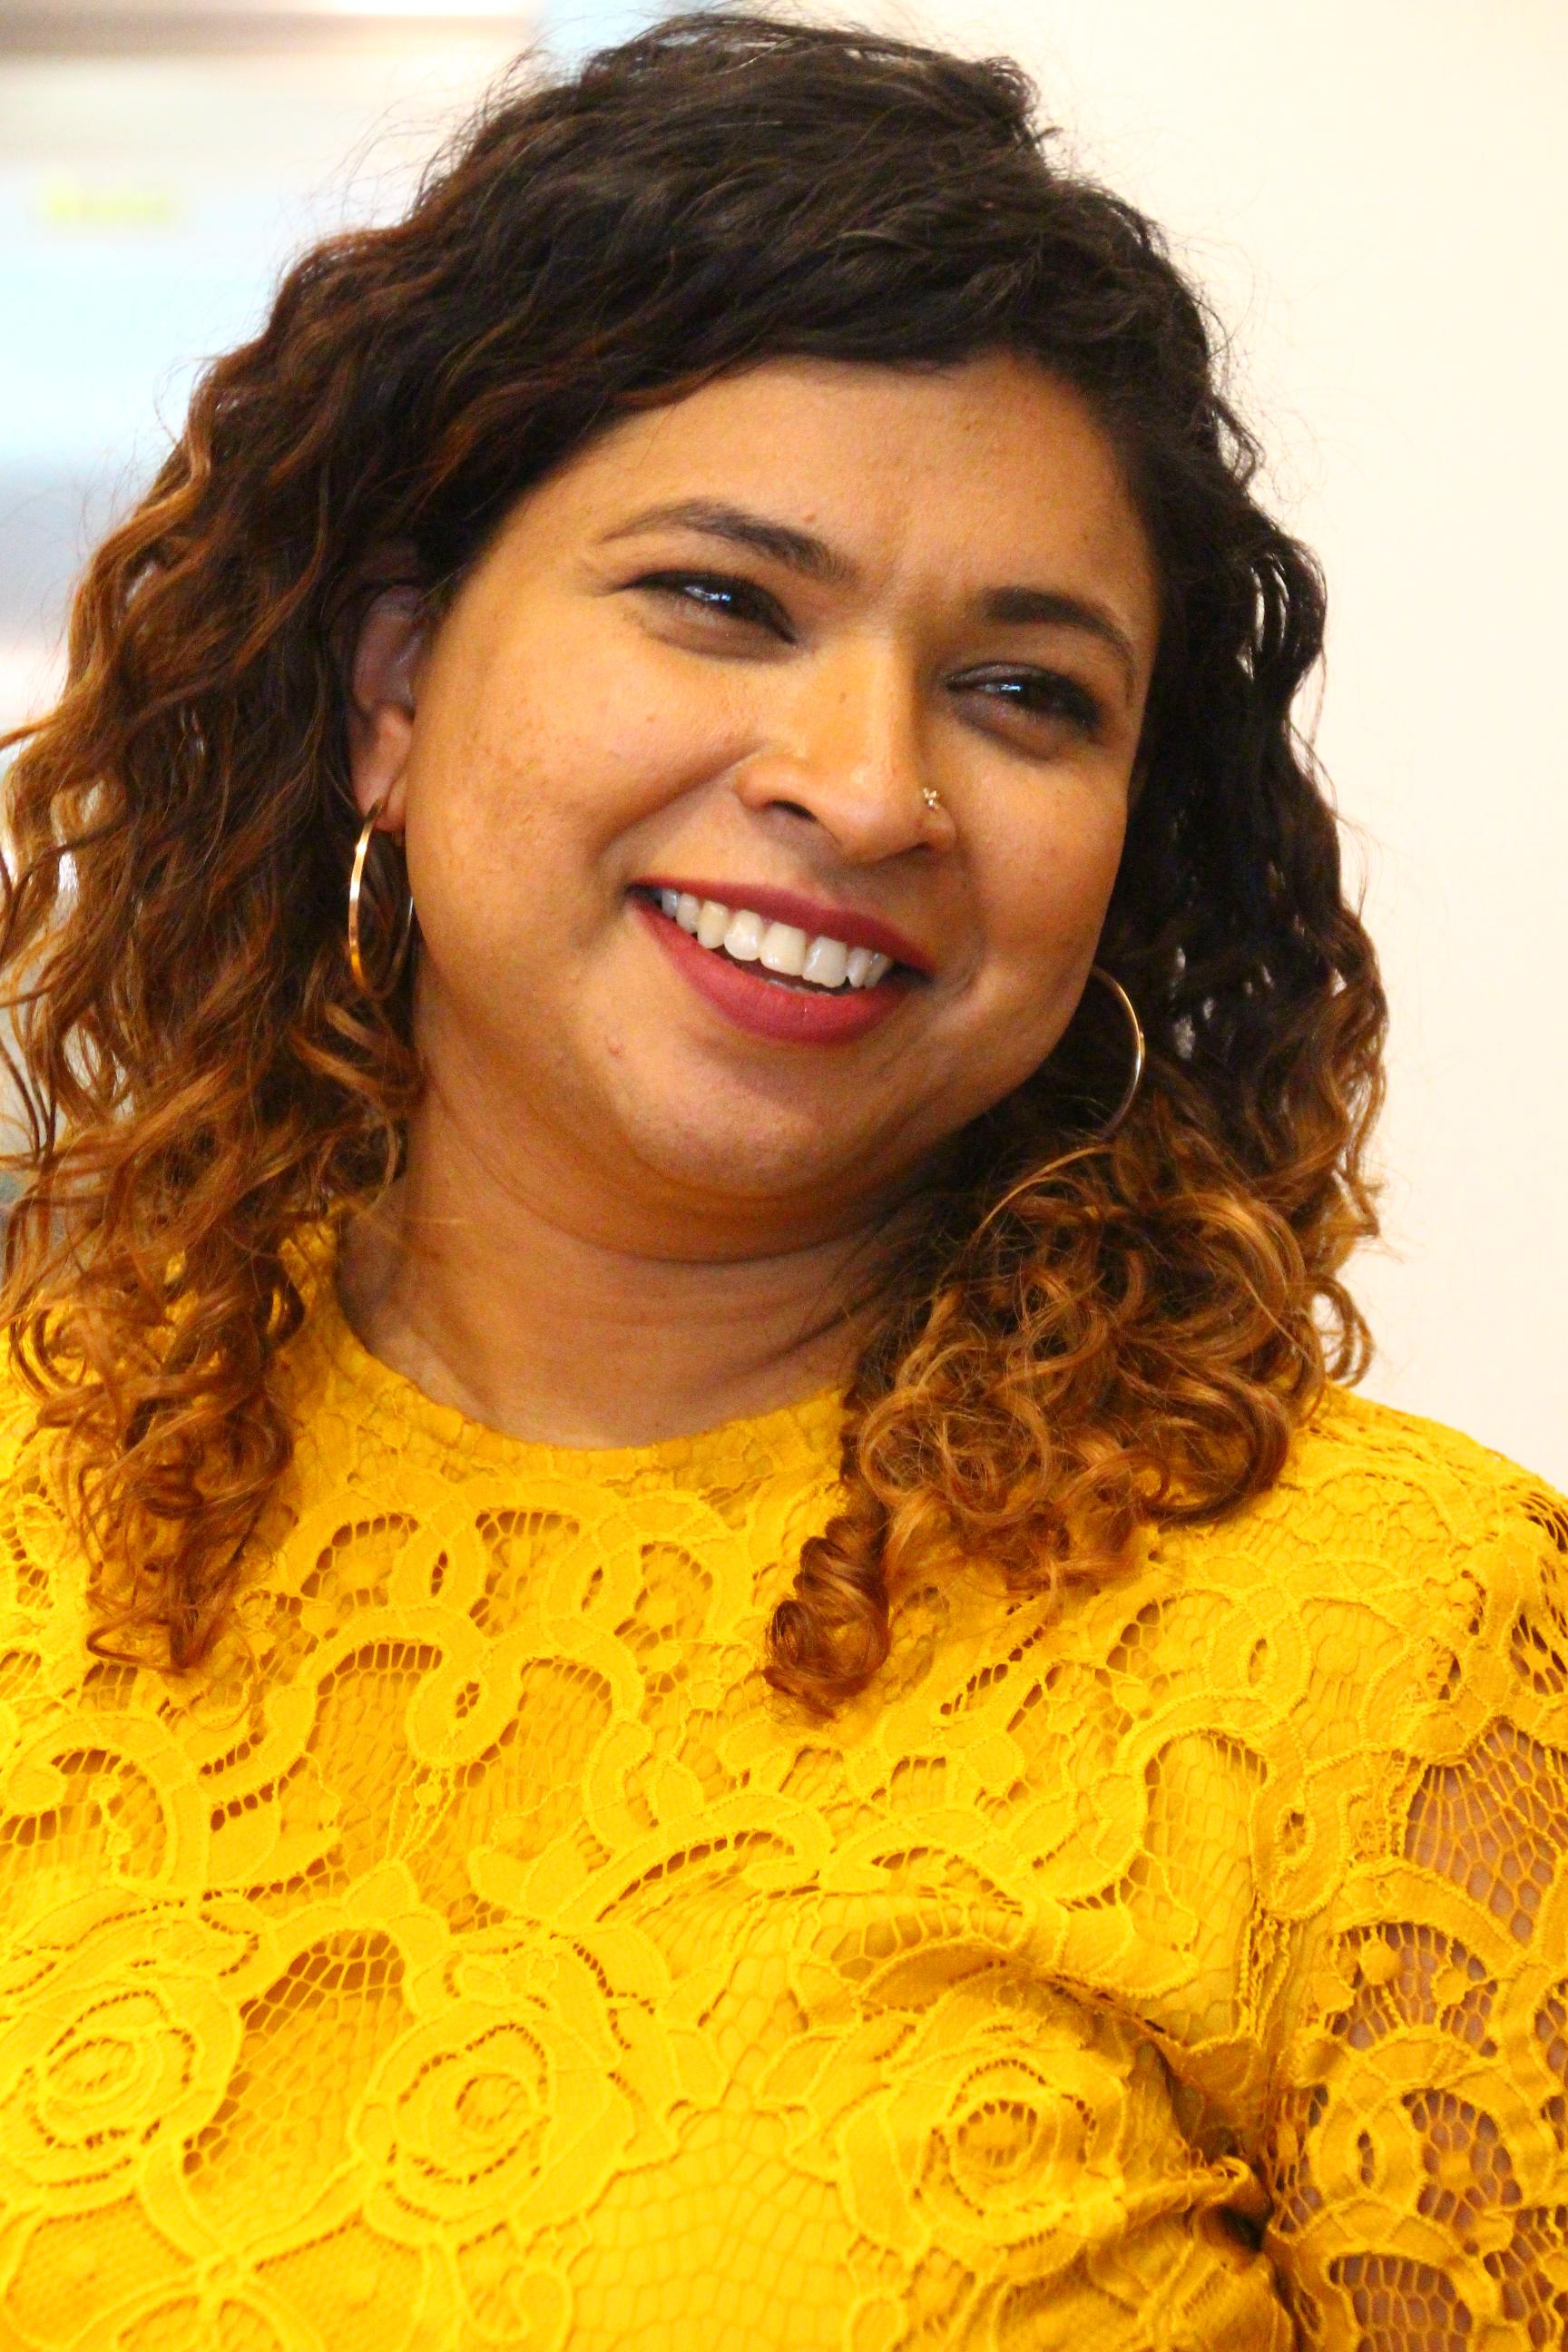 Aarti Sequeira Recipes Food Tv aarti sequeira - wikipedia